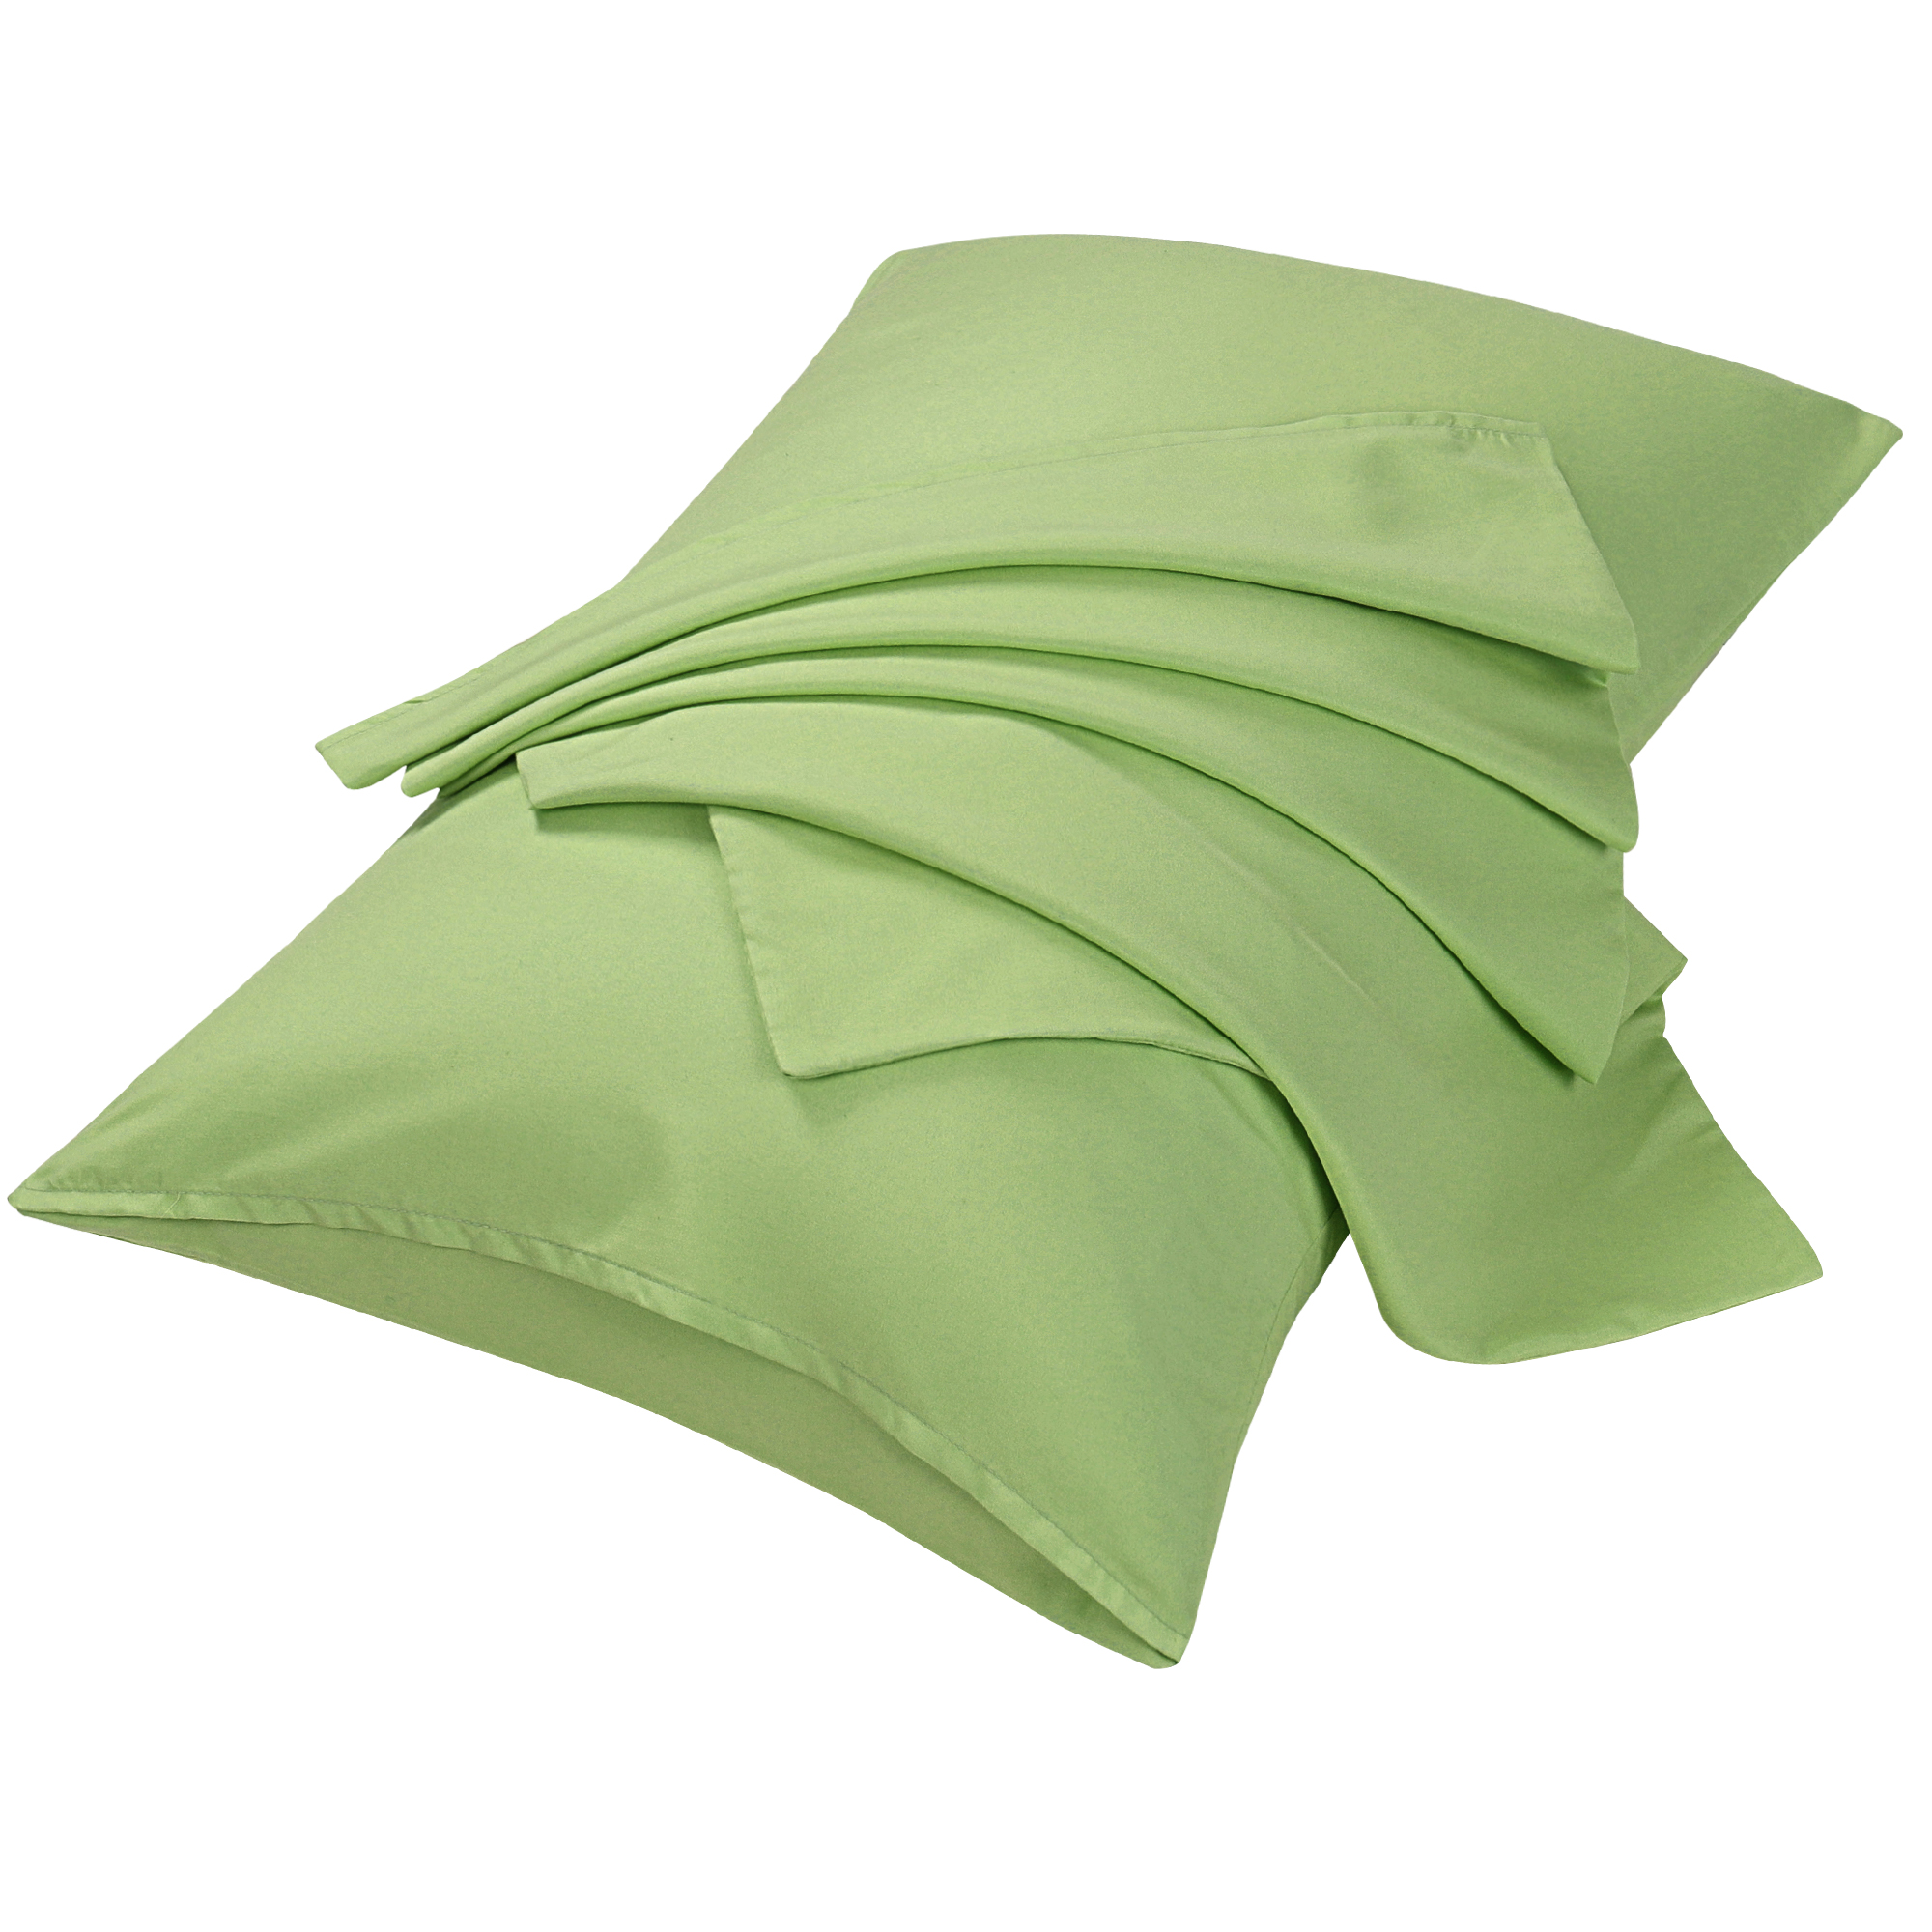 "2pcs Pillowcases Soft Microfiber, No Wrinkle, Sage Travel (14"" x 20"")"